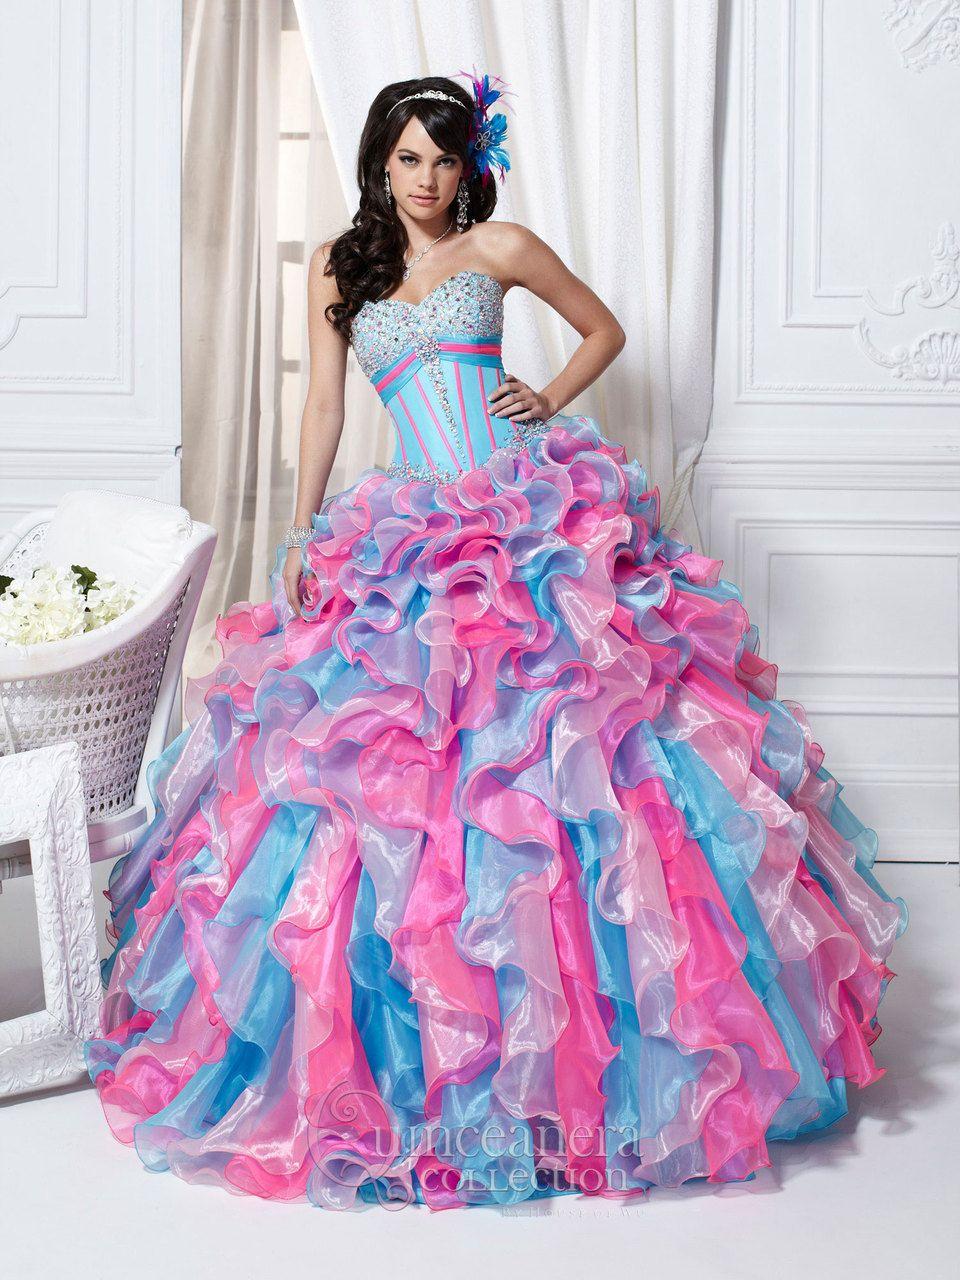 Increíble Vestidos De Dama De Kansas City Imagen - Colección de ...